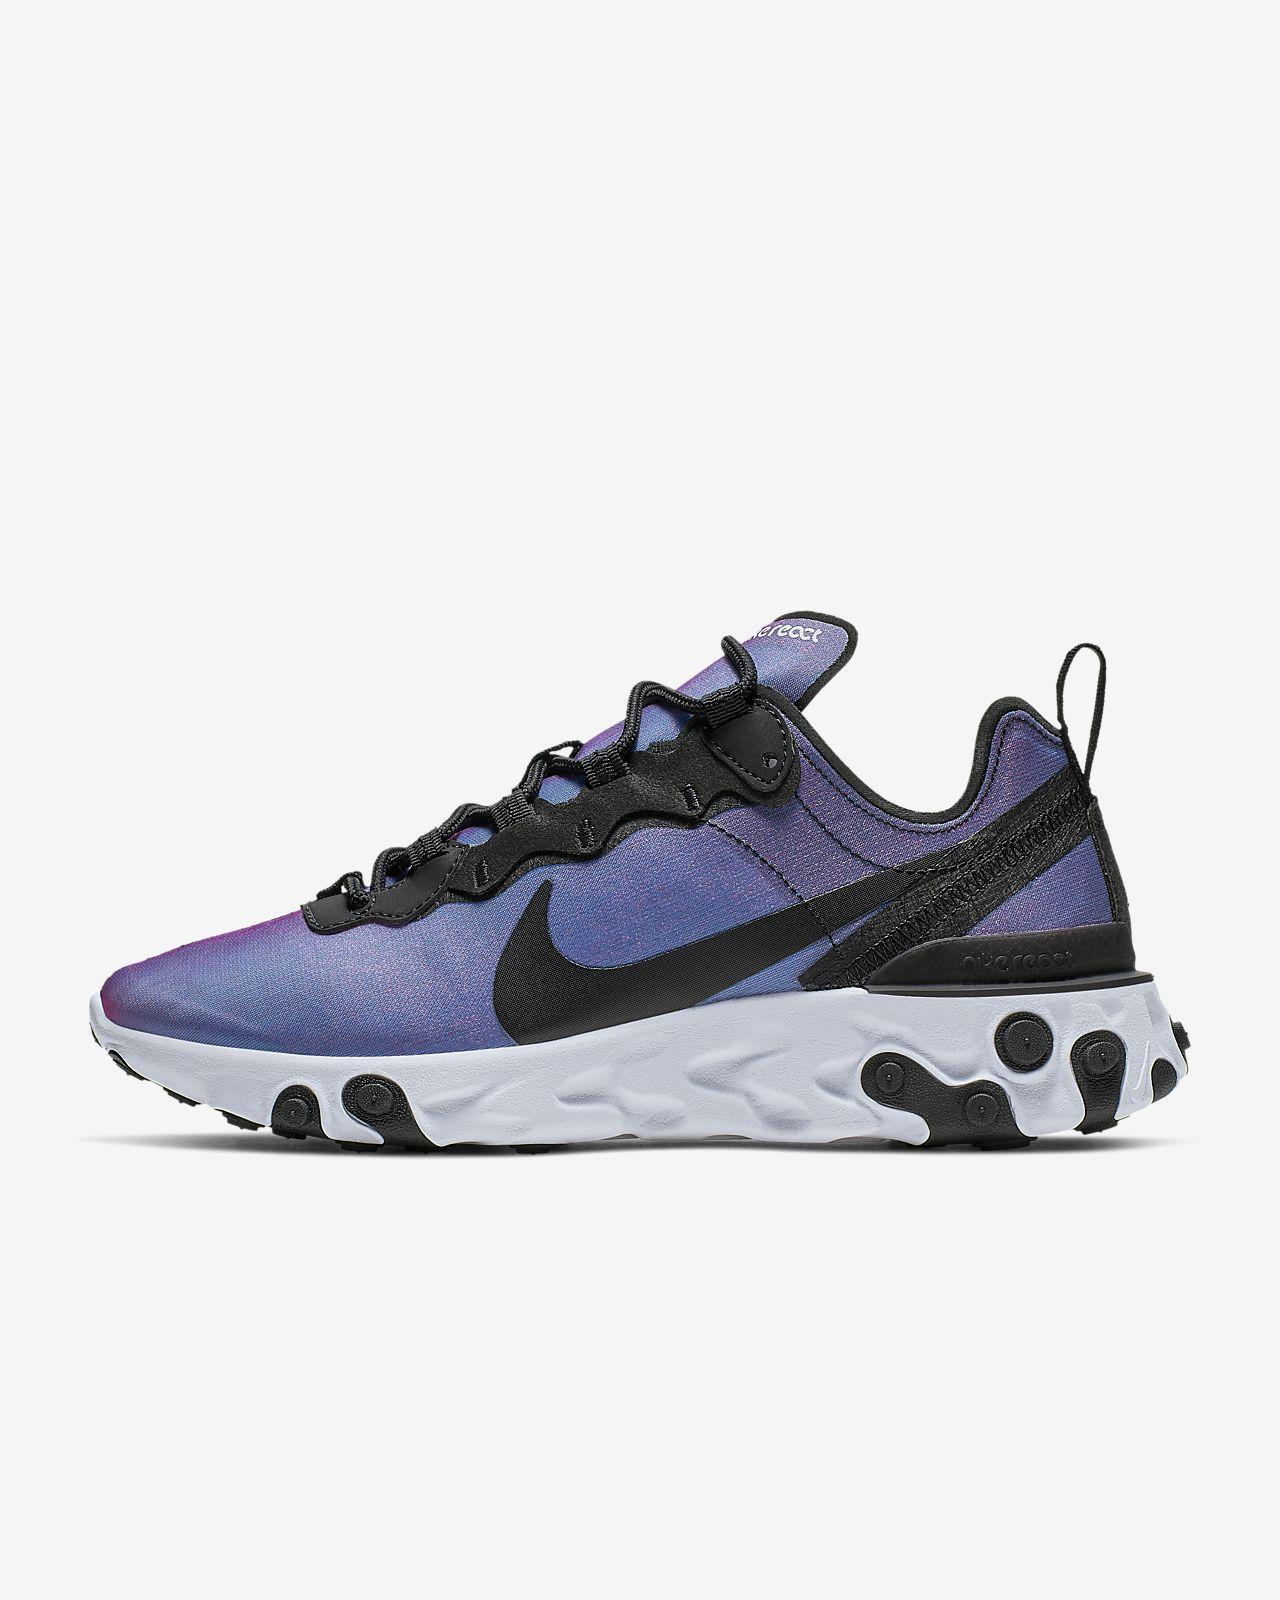 Sko Nike React Element 55 Premium för kvinnor